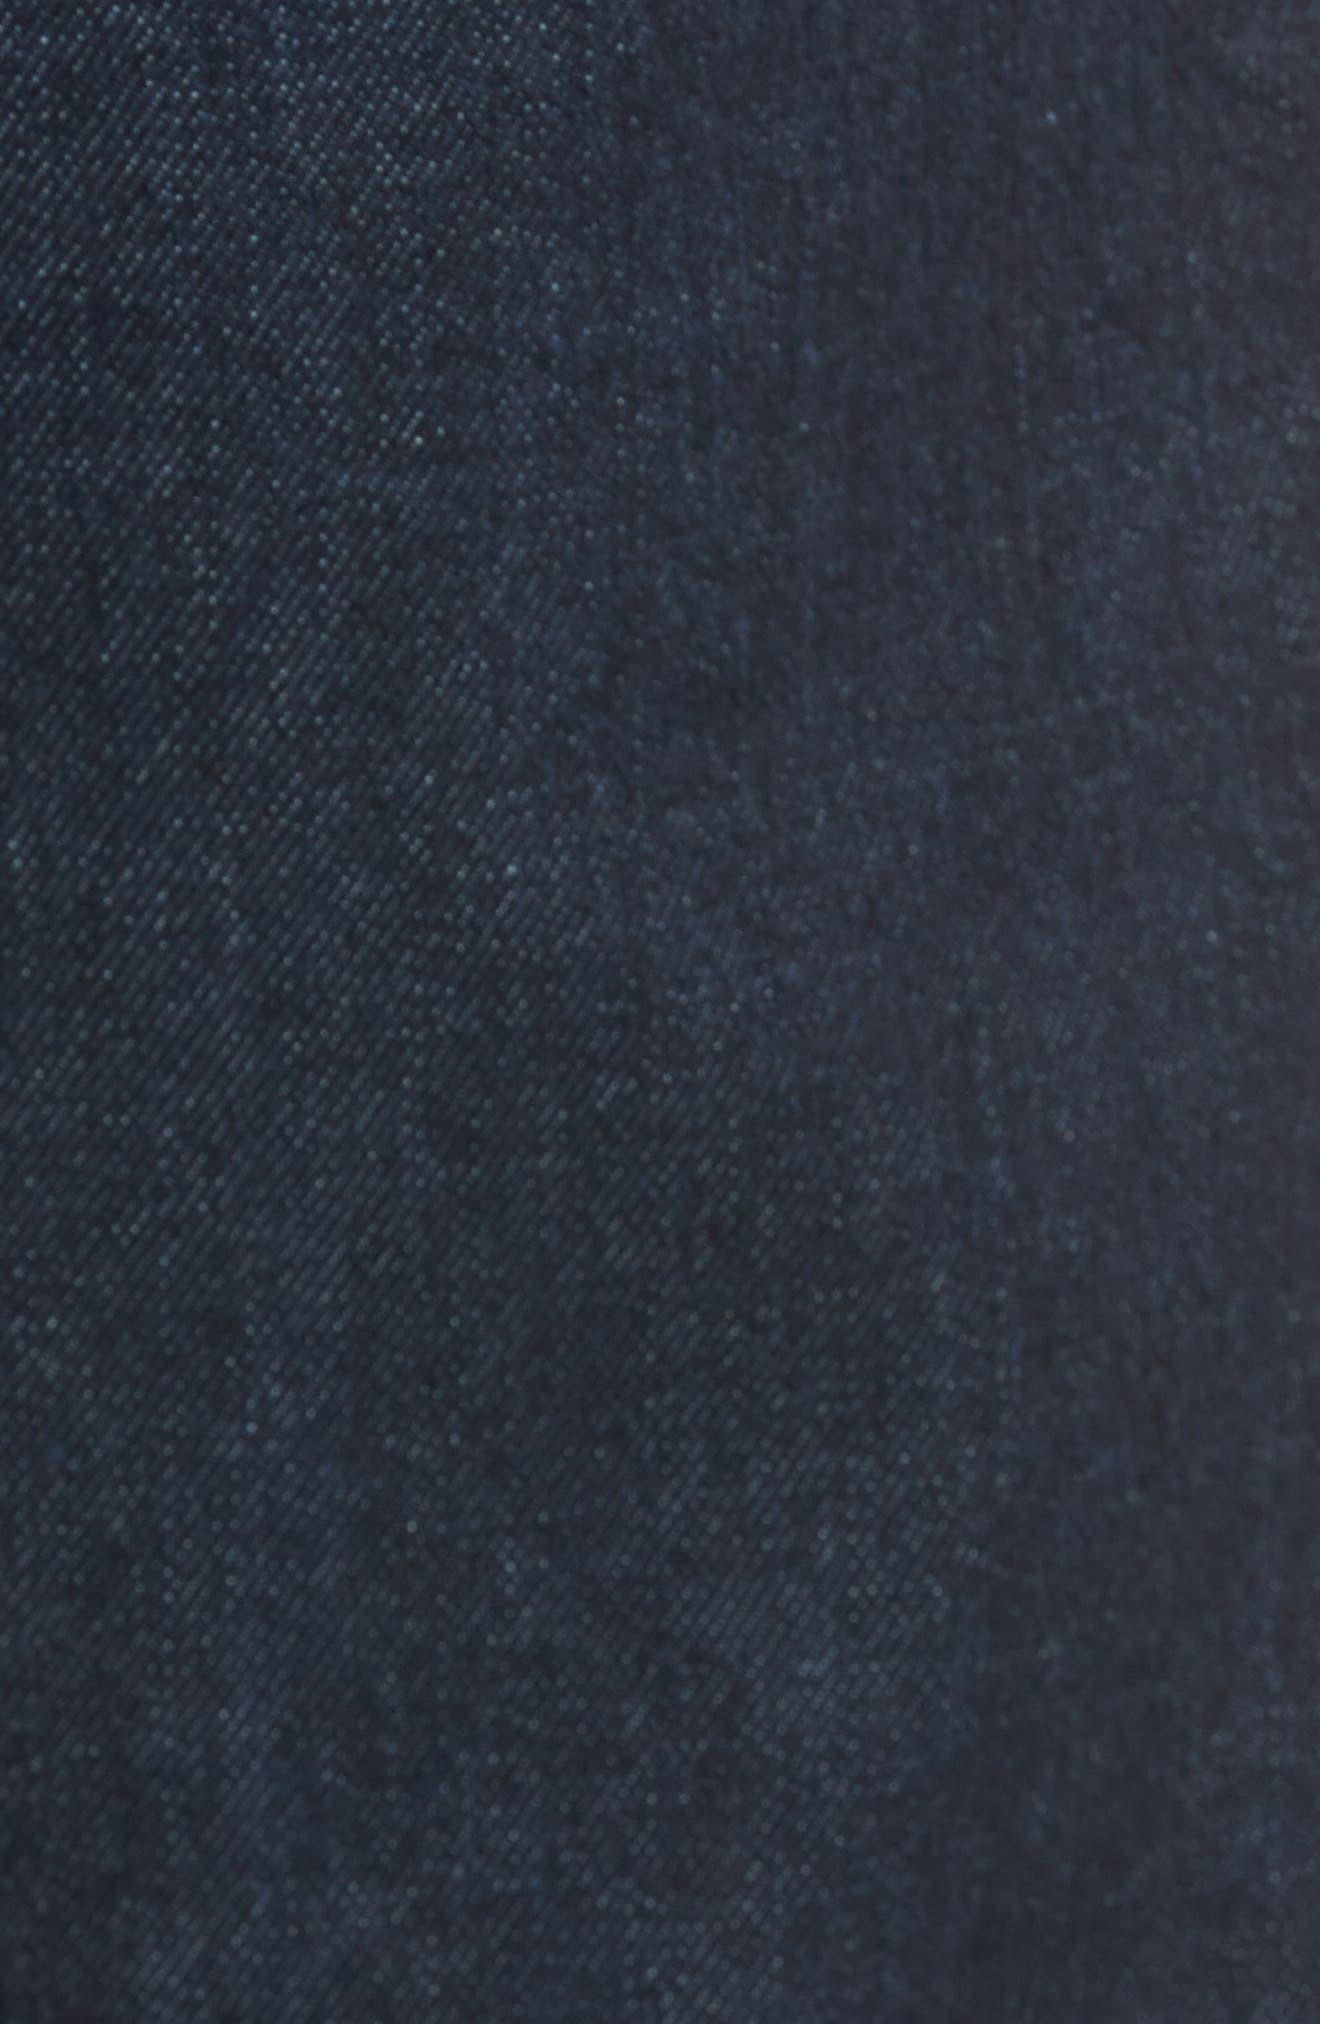 Jim Slim Fit Selvedge Jeans,                             Alternate thumbnail 5, color,                             460